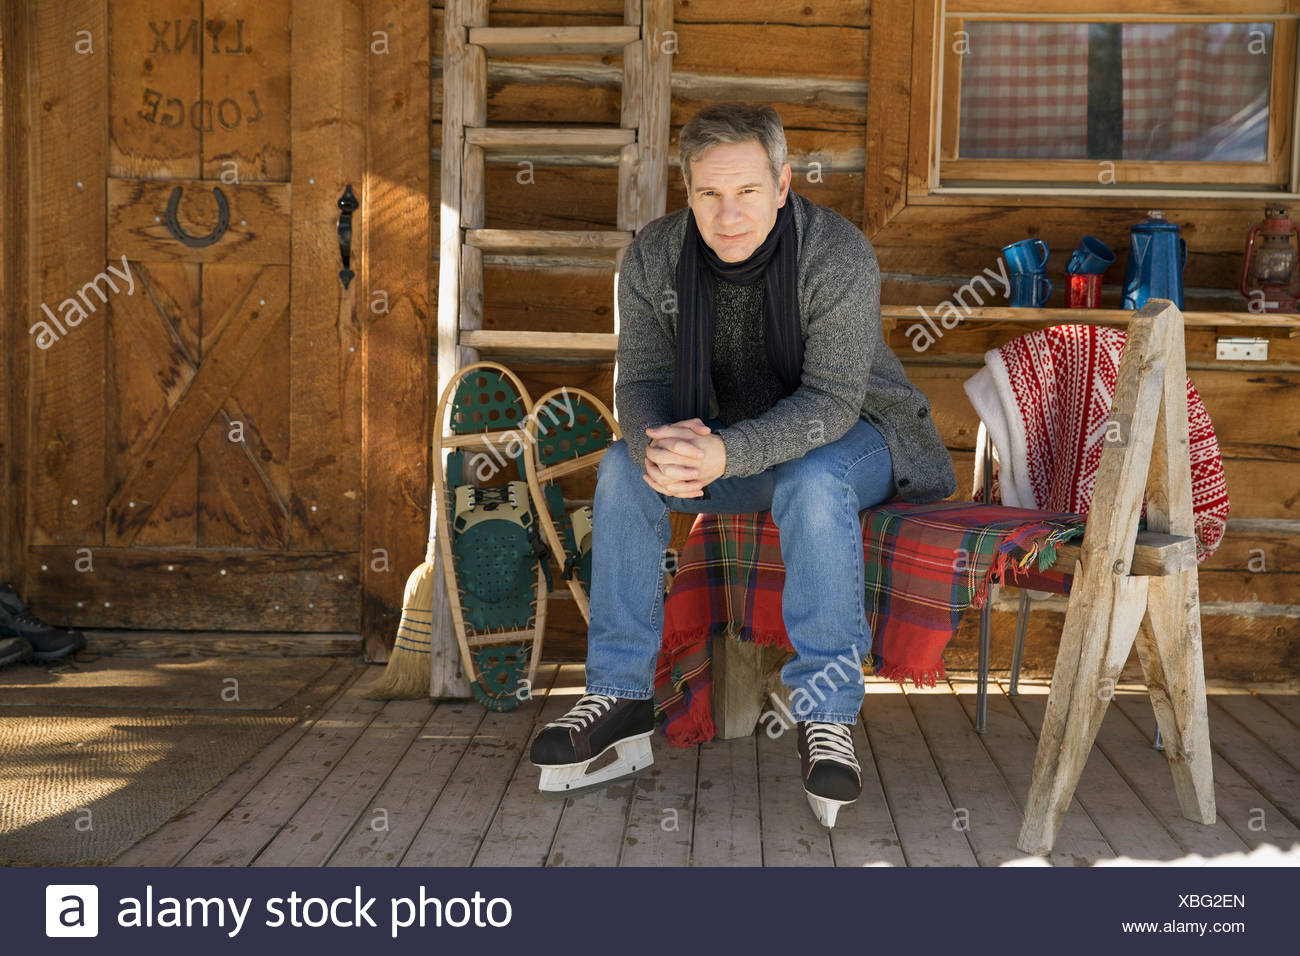 Man sitting outside of cabin wearing ice skates - Stock Image